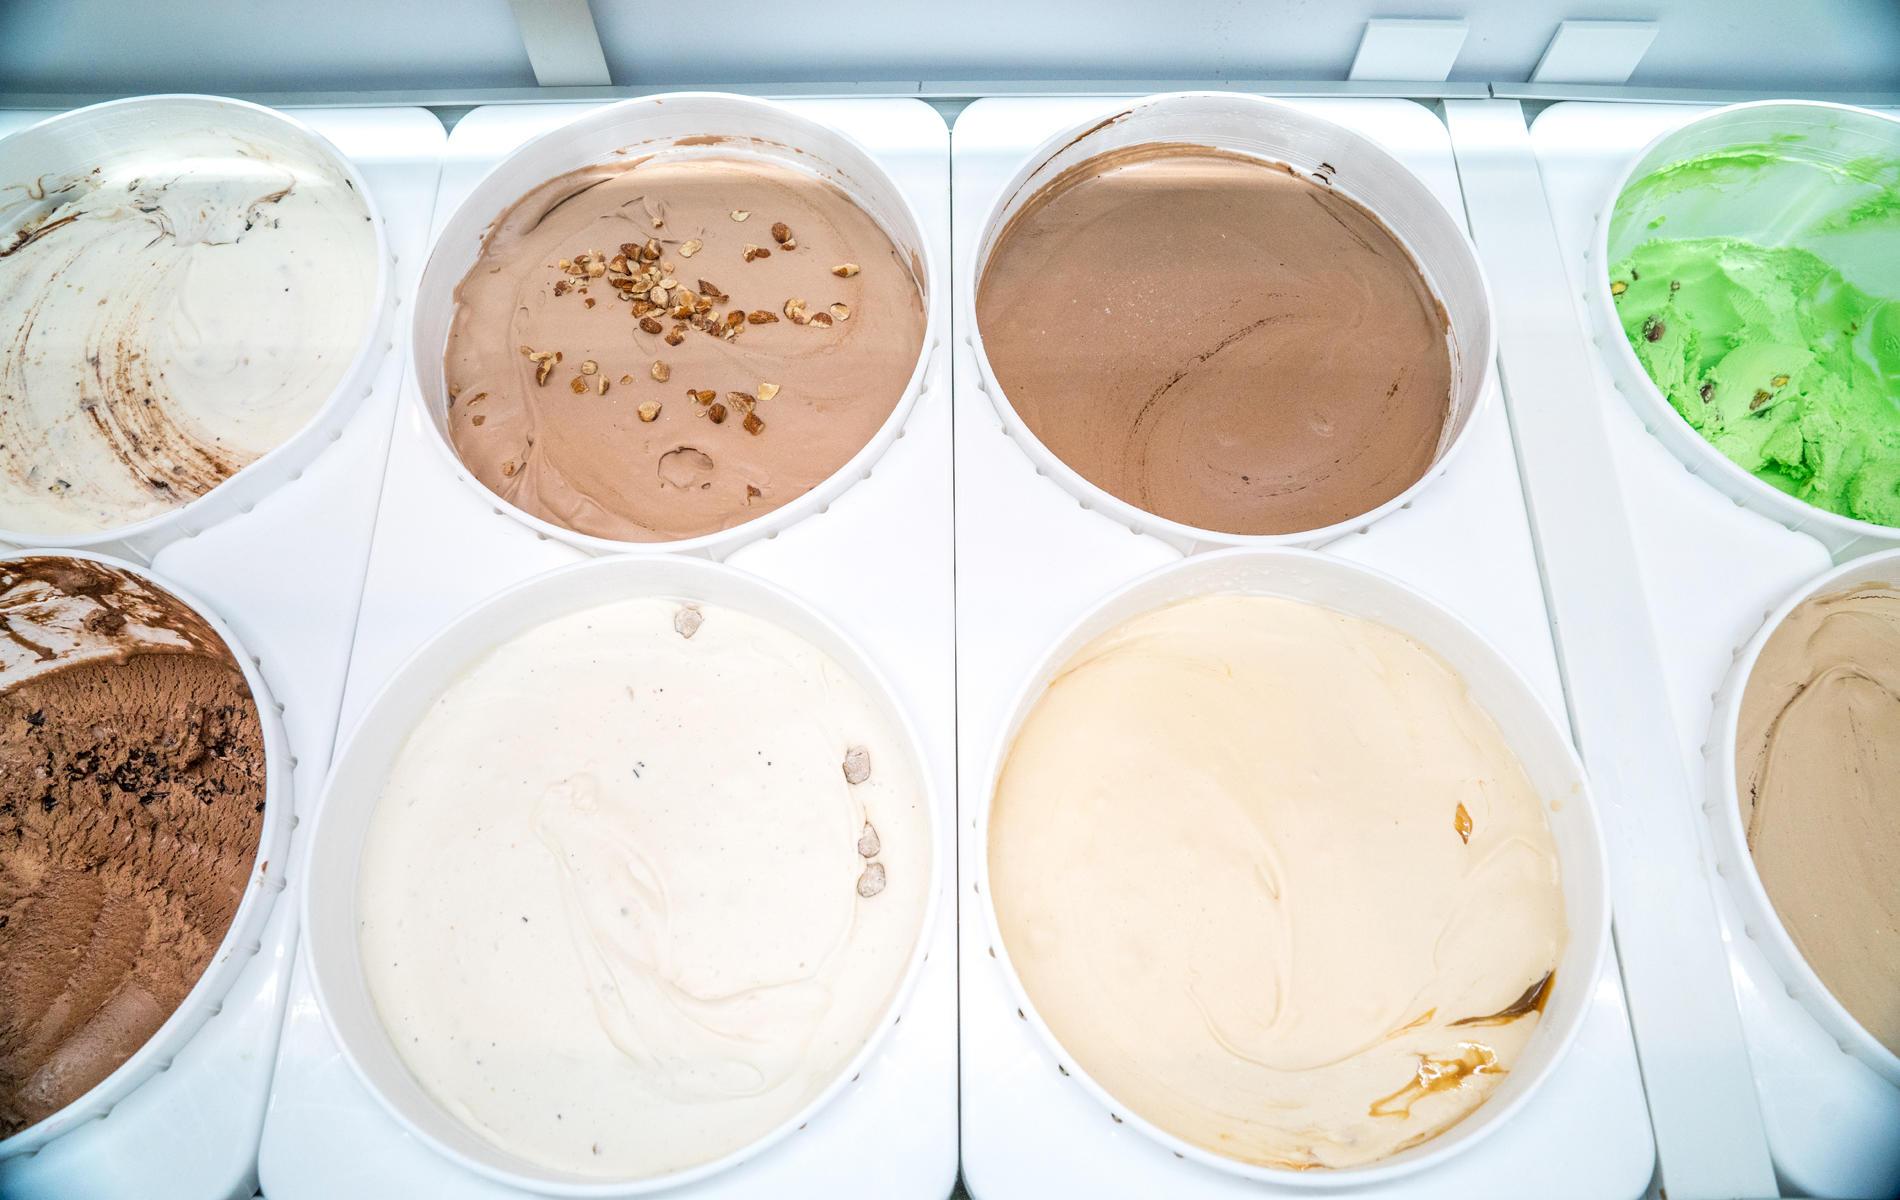 Big Dipper Creamery - Blaine image 27